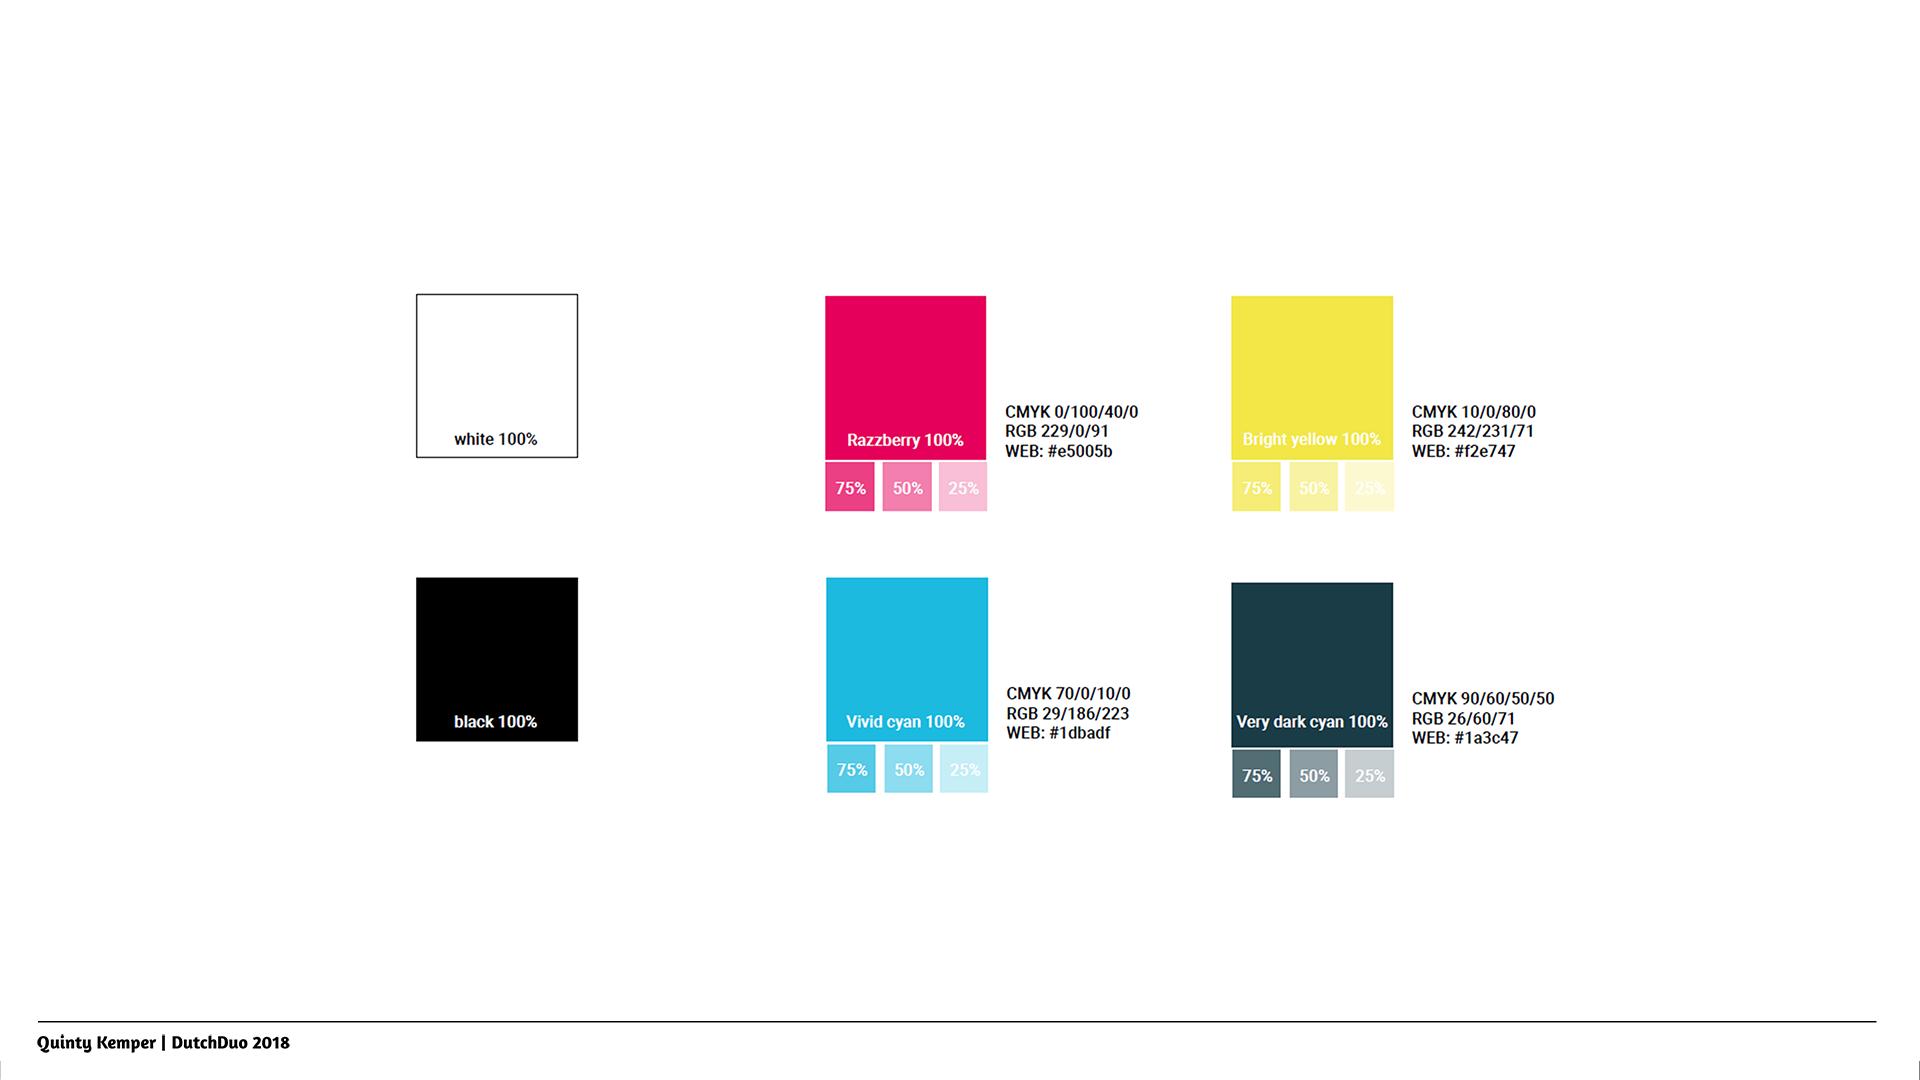 Quinty Kemper Portfolio 2018 Kyra logo 2 color palette